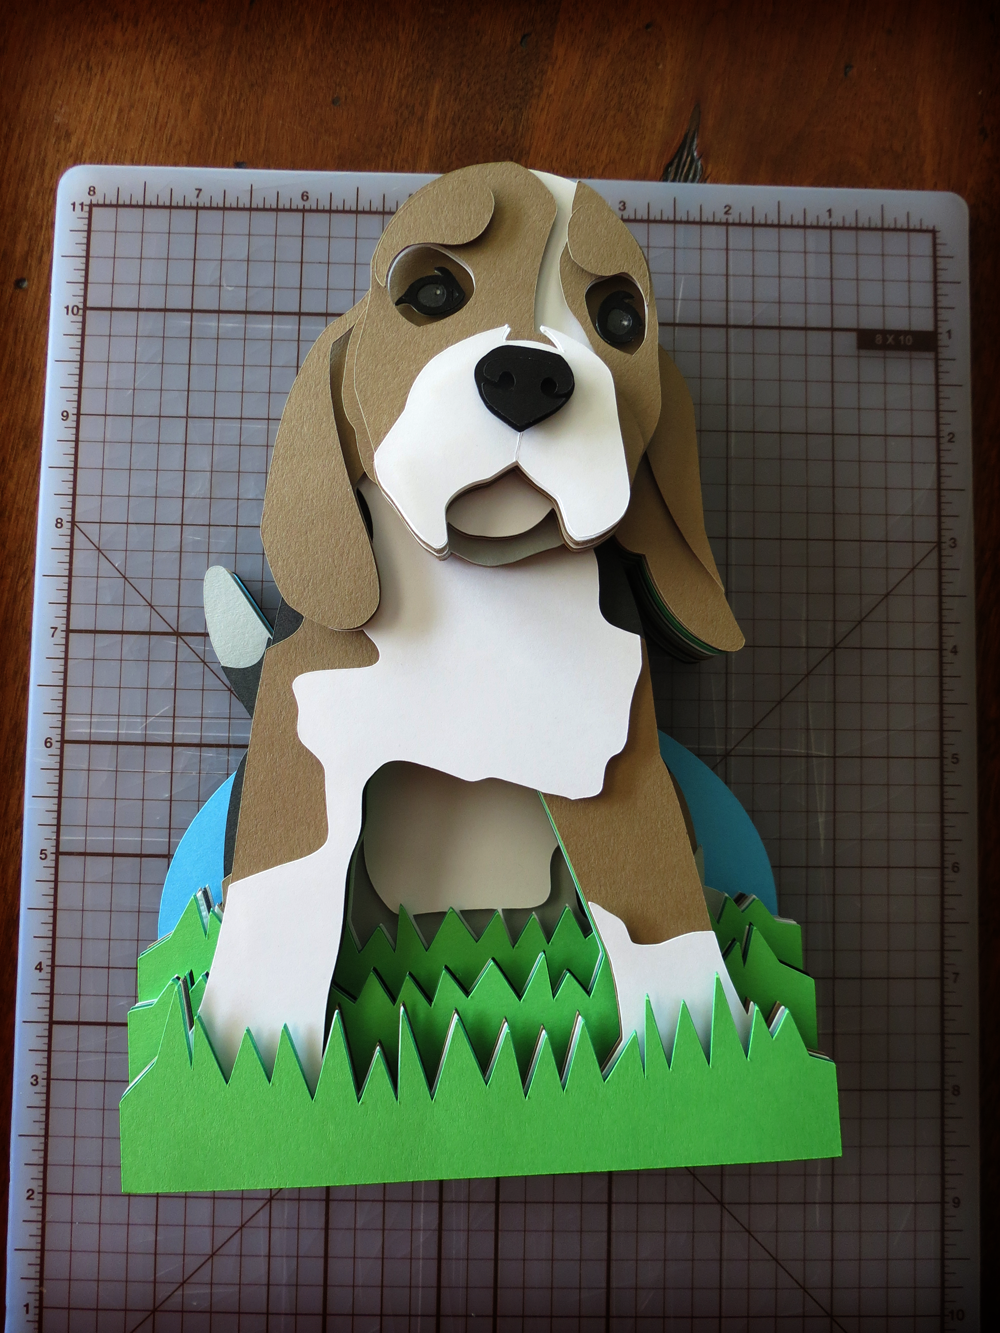 beagle01.png